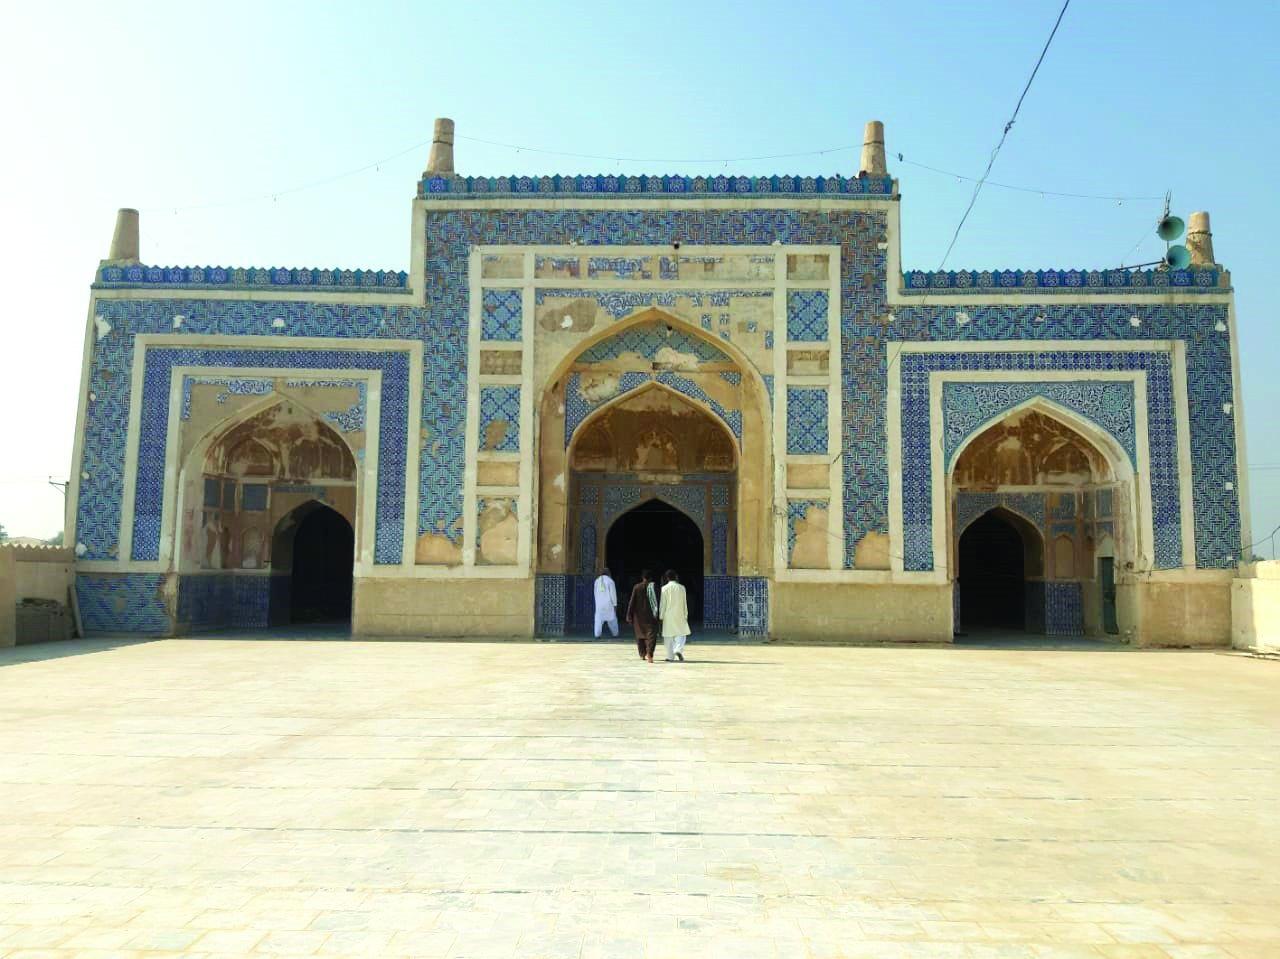 history neglected restoring khudabad mosque losing heritage